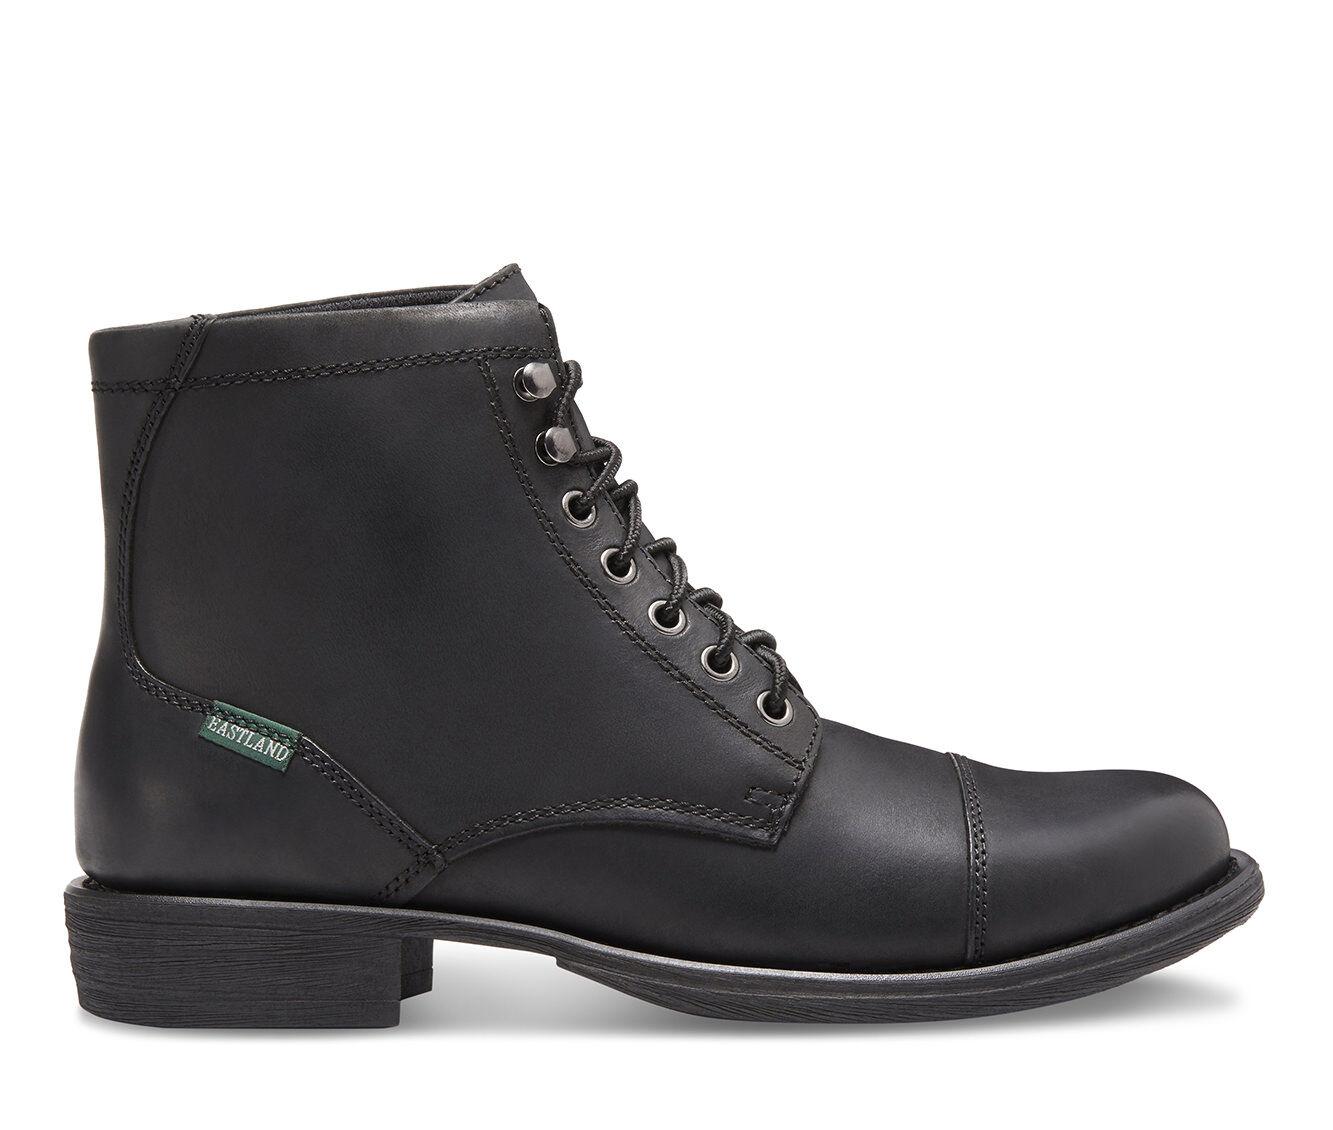 uk shoes_kd1702